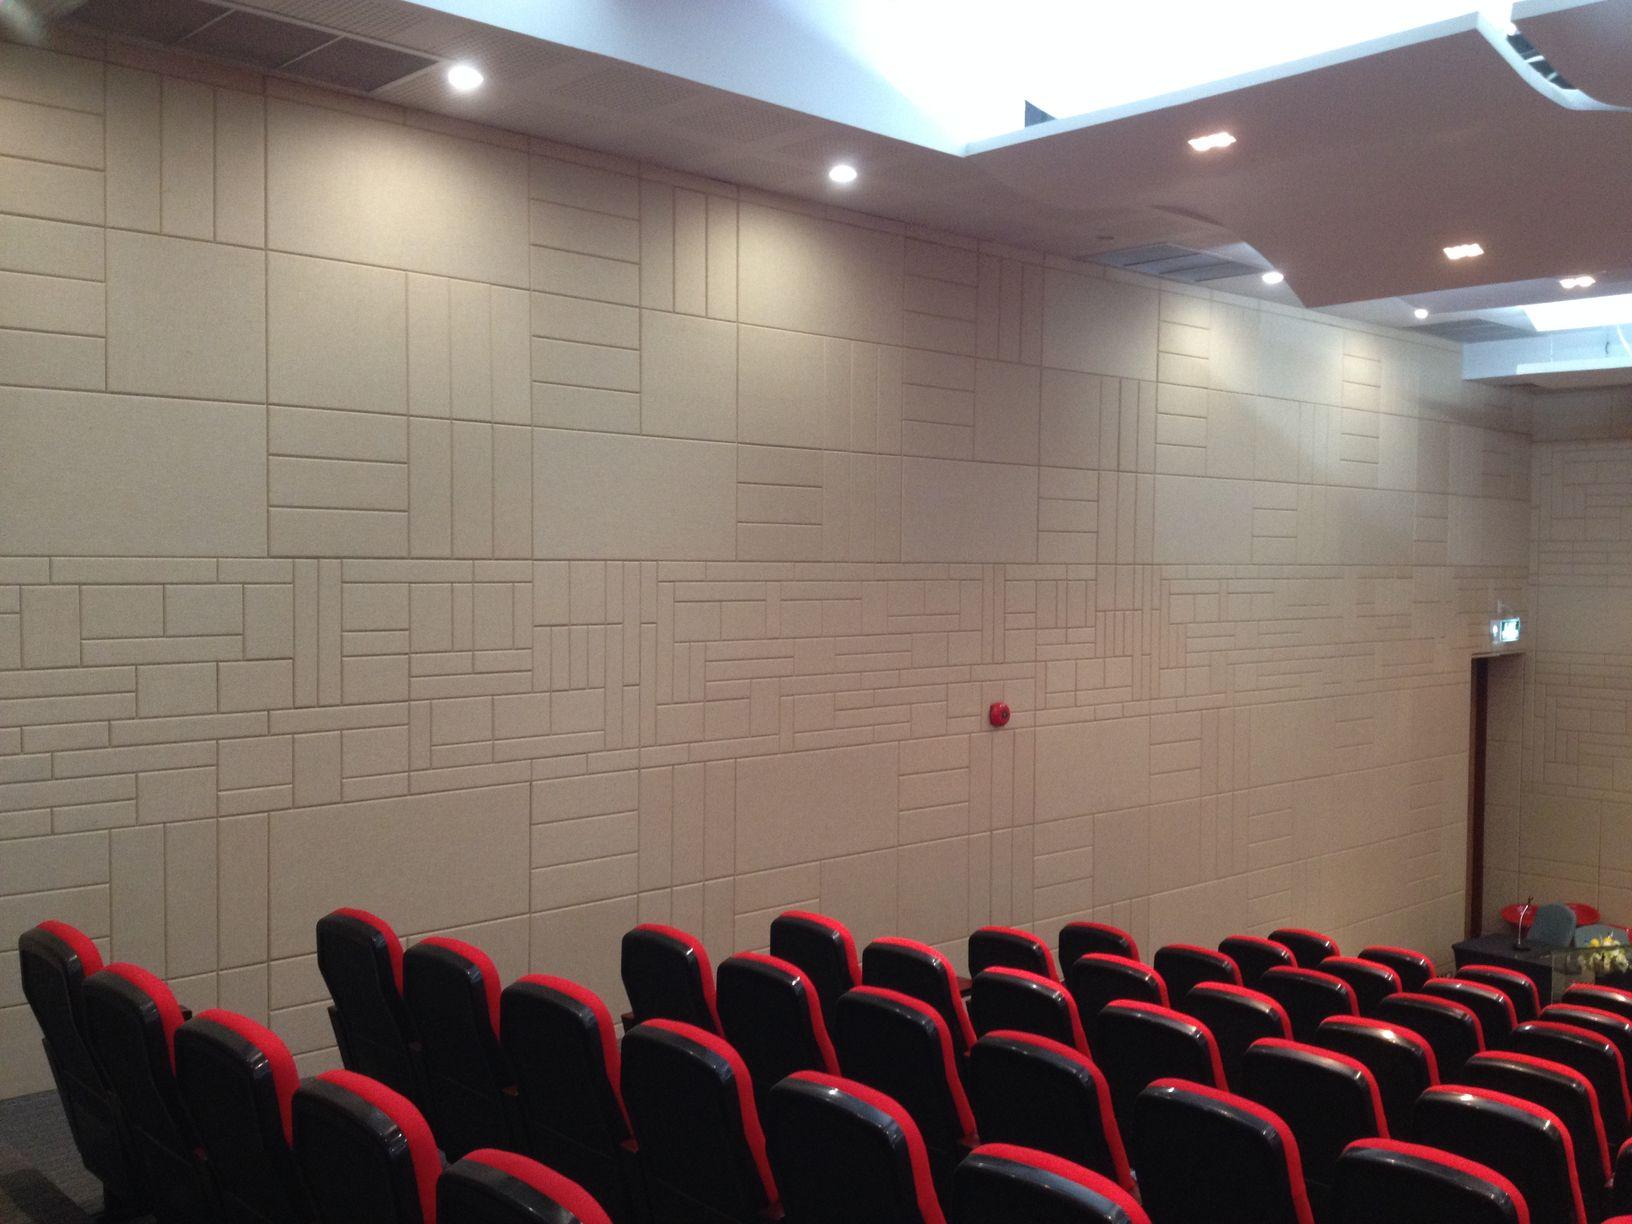 SCG Sound Absorption Installation Zandera Wall Decorative (24)